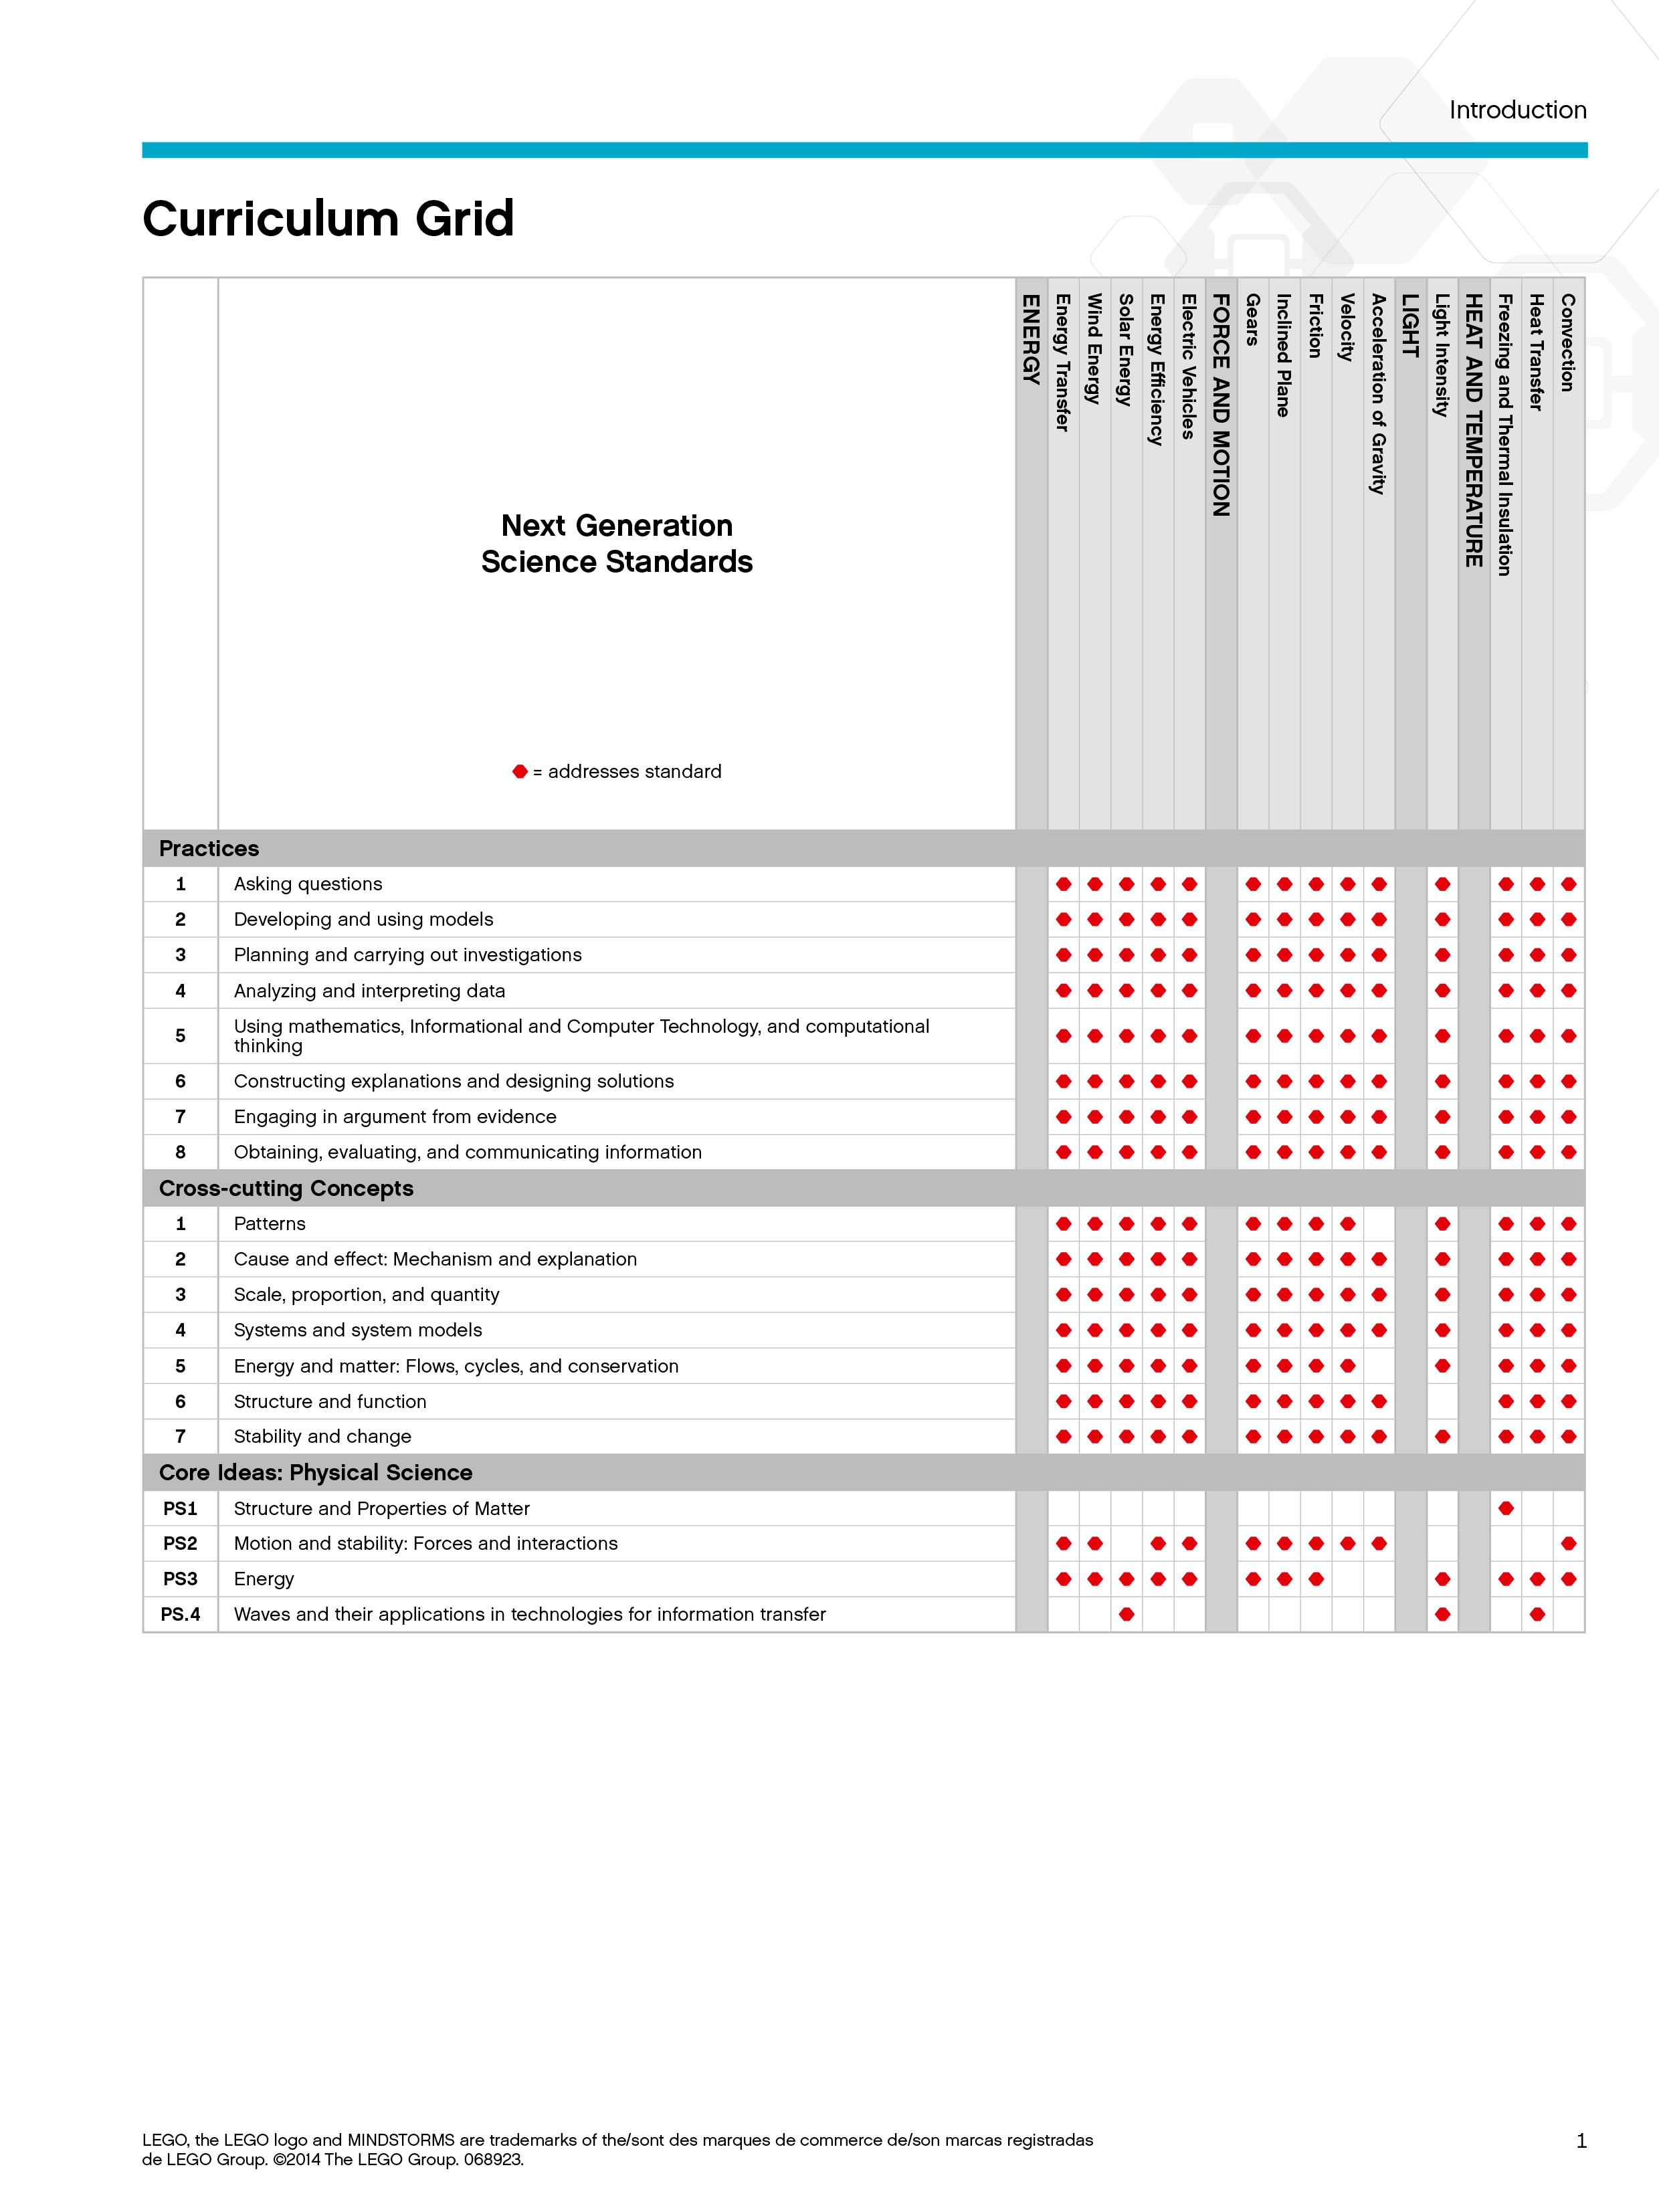 MINDSTORMS EV3 Science curriculum grid